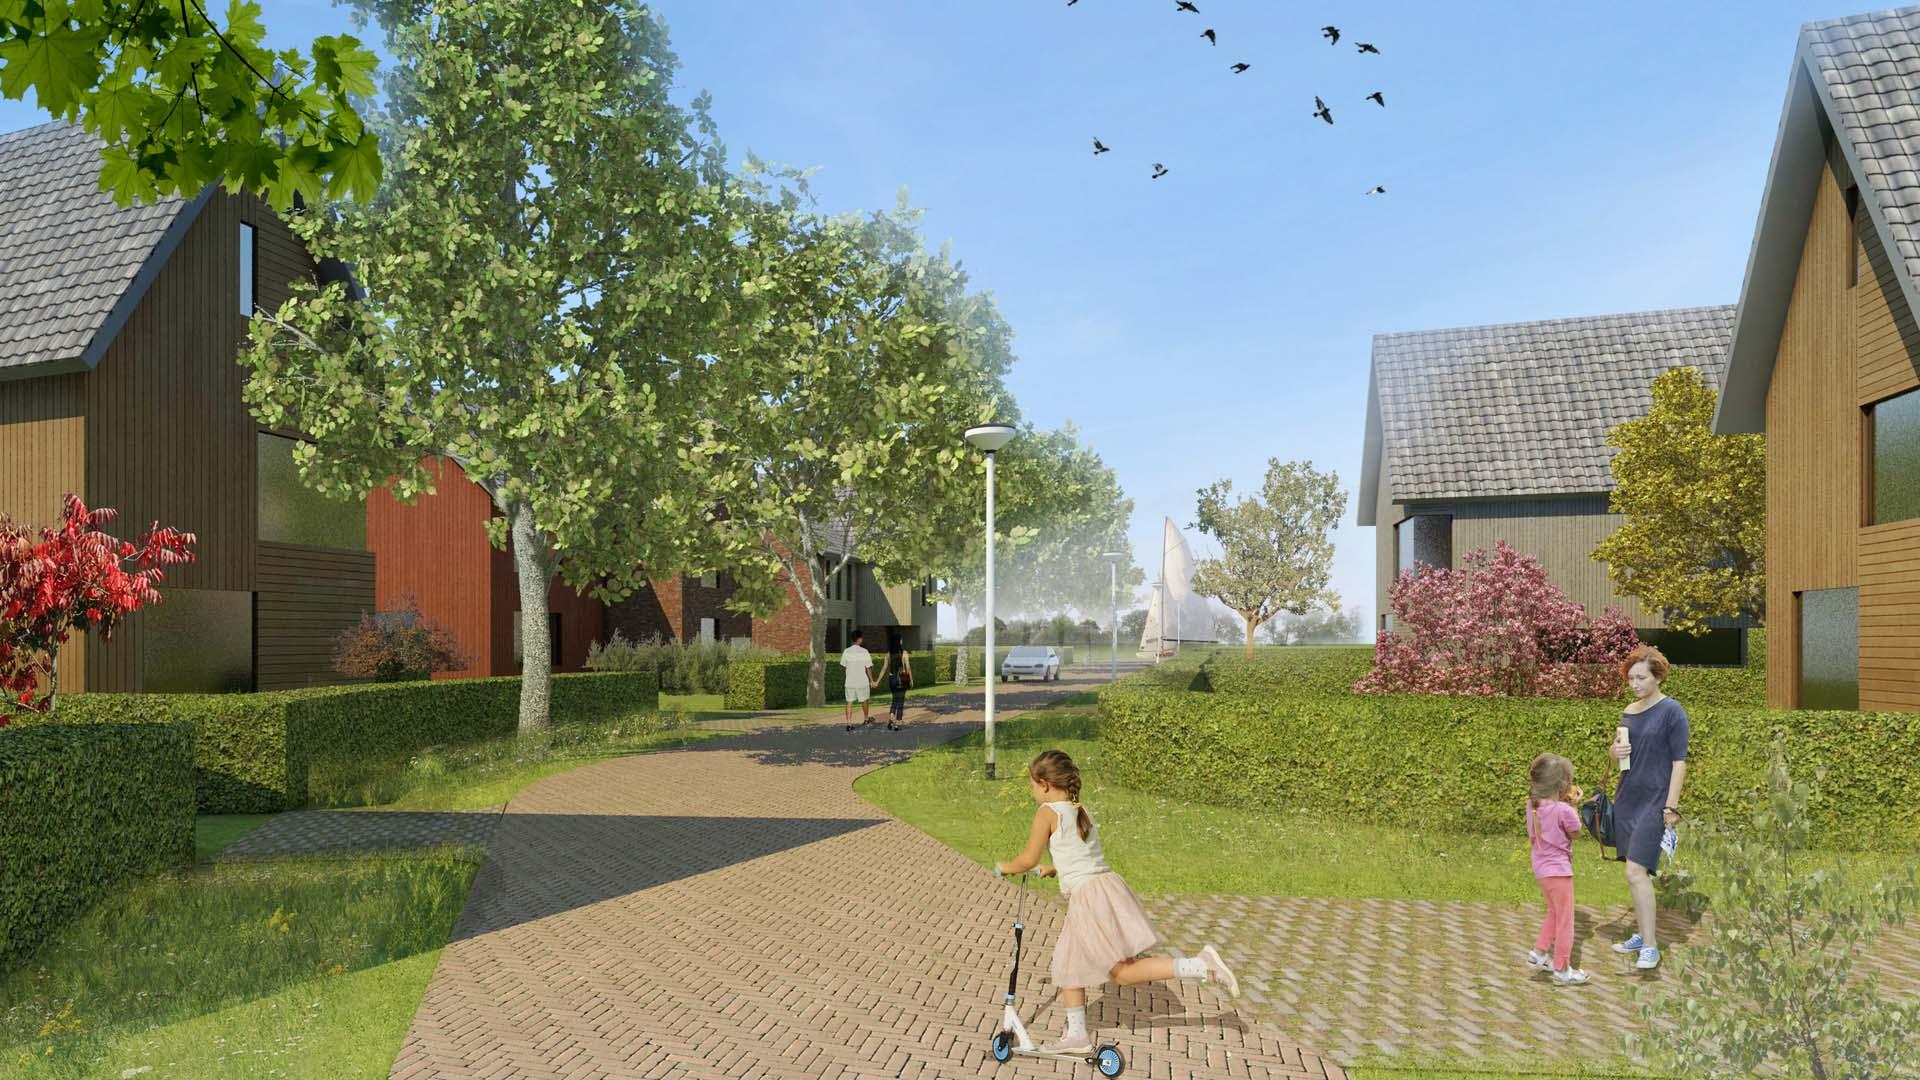 18028_Unia Zuidlanden Leeuwarden_02